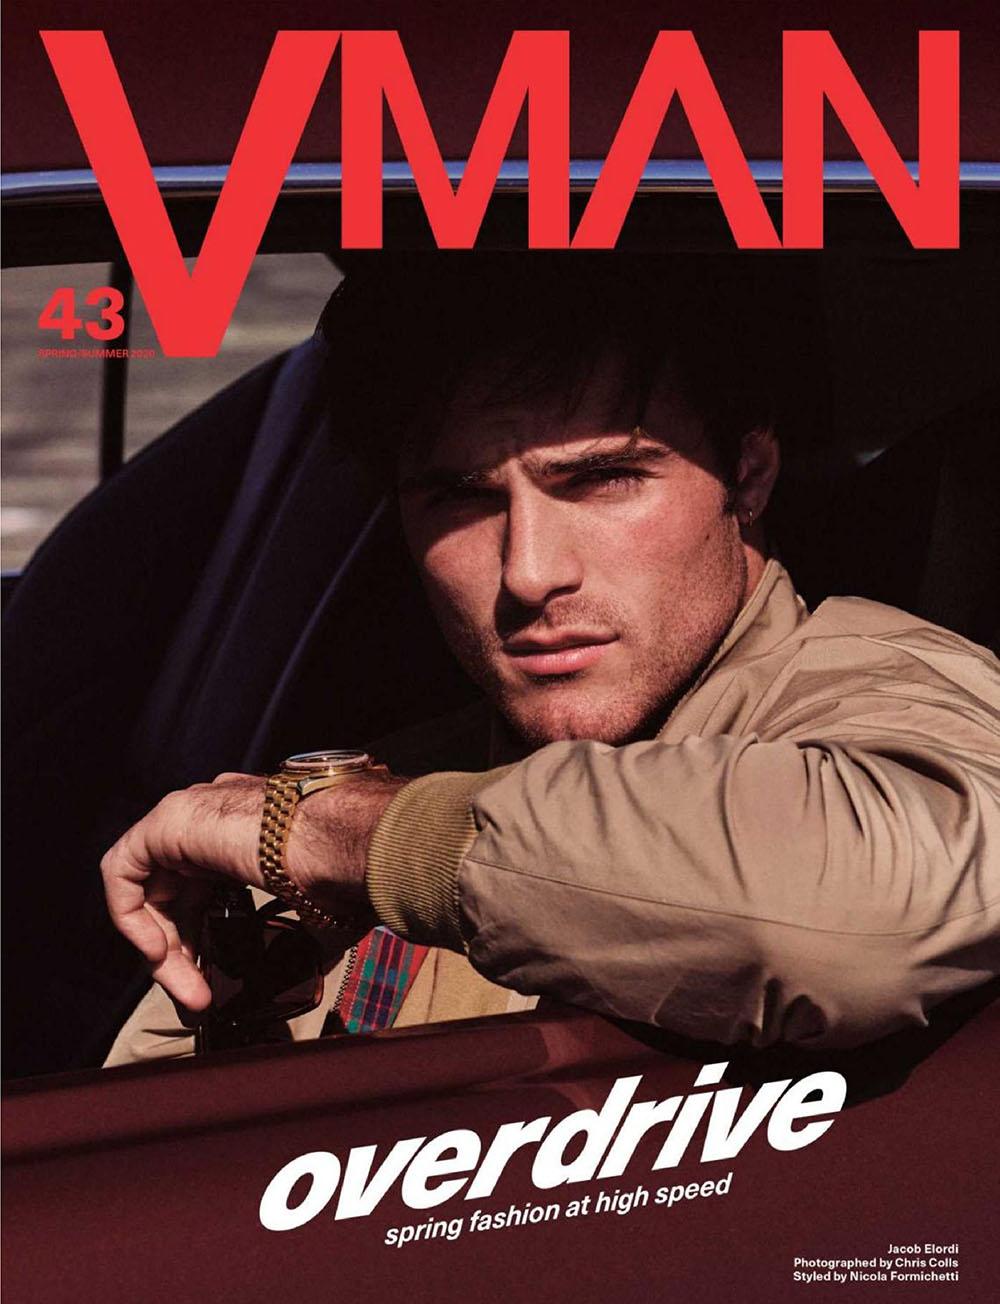 Jacob Elordi covers VMan Spring Summer 2020 by Chris Colls